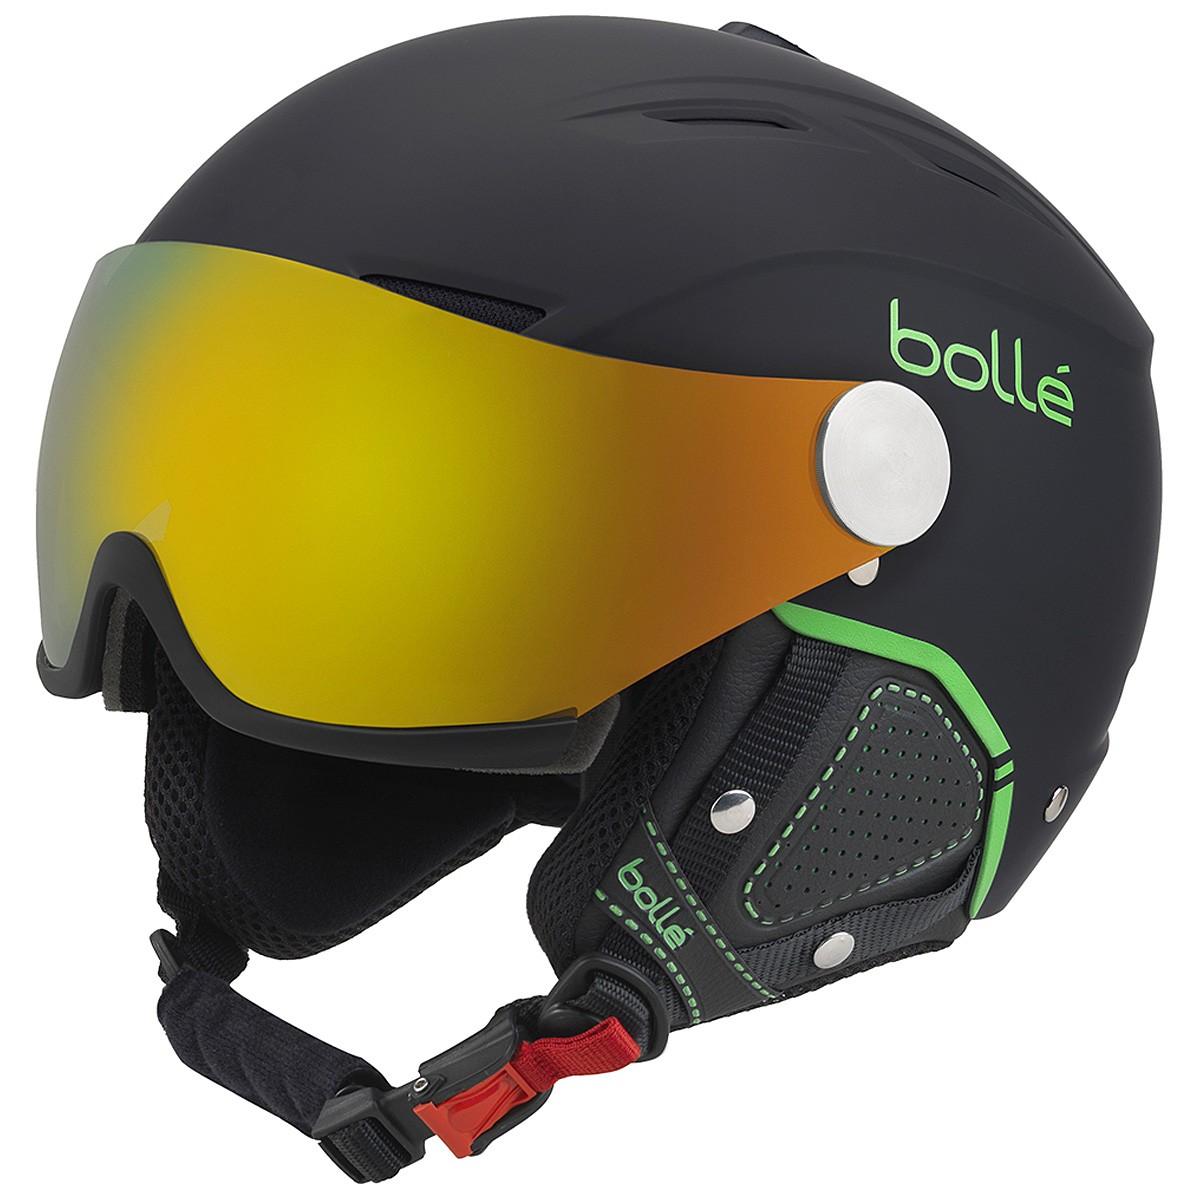 Ski Helmet Bolle Backline Visor Premium Ski And